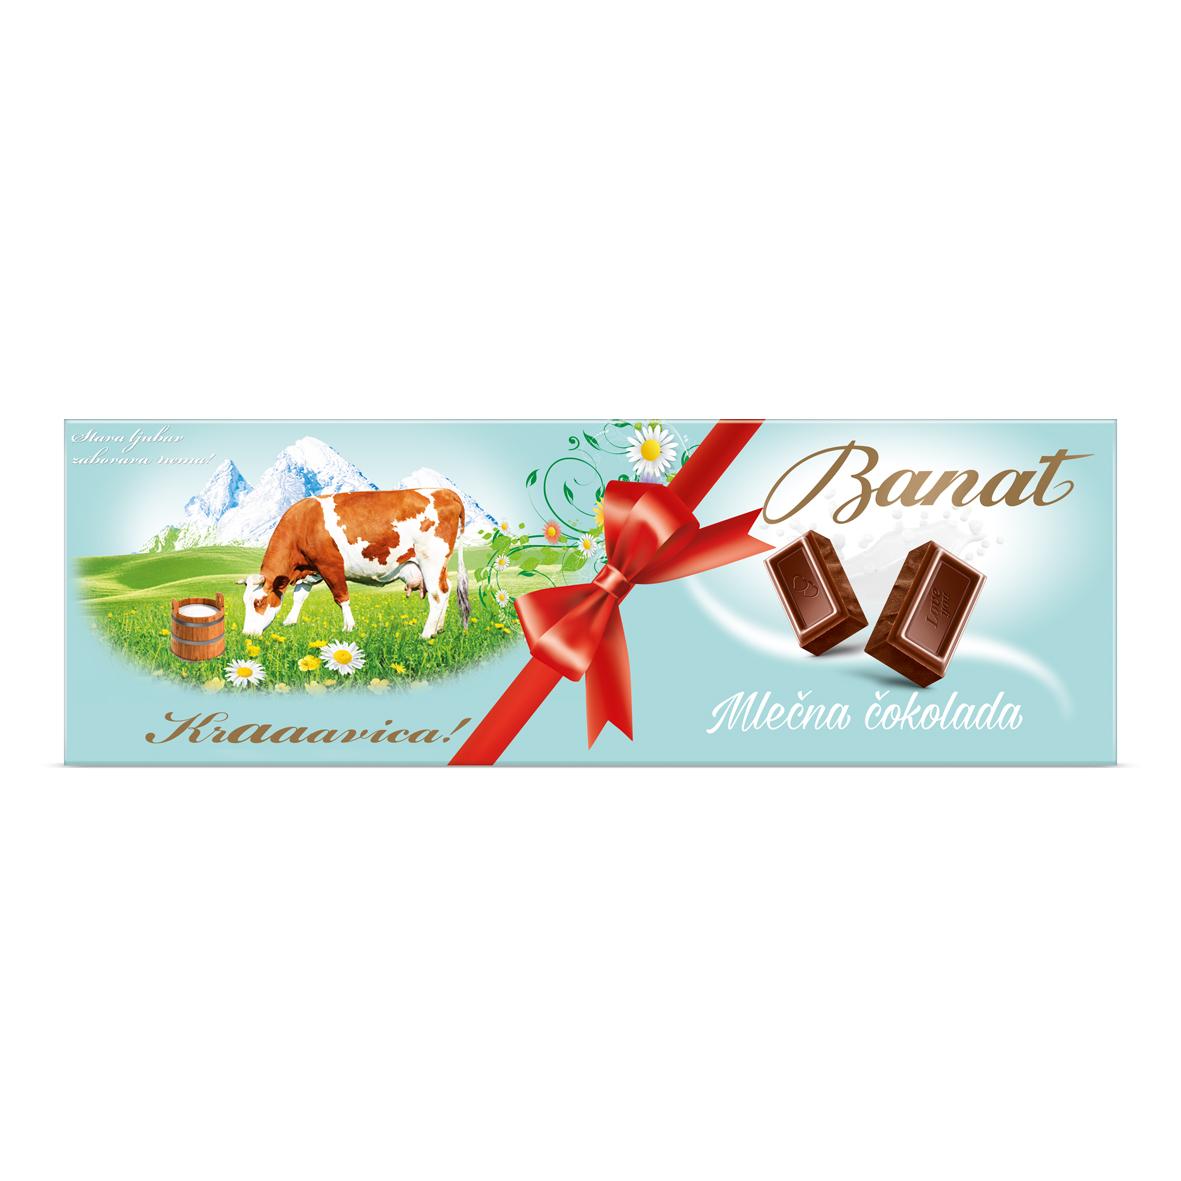 Banat Cokolada Mlecna 240g